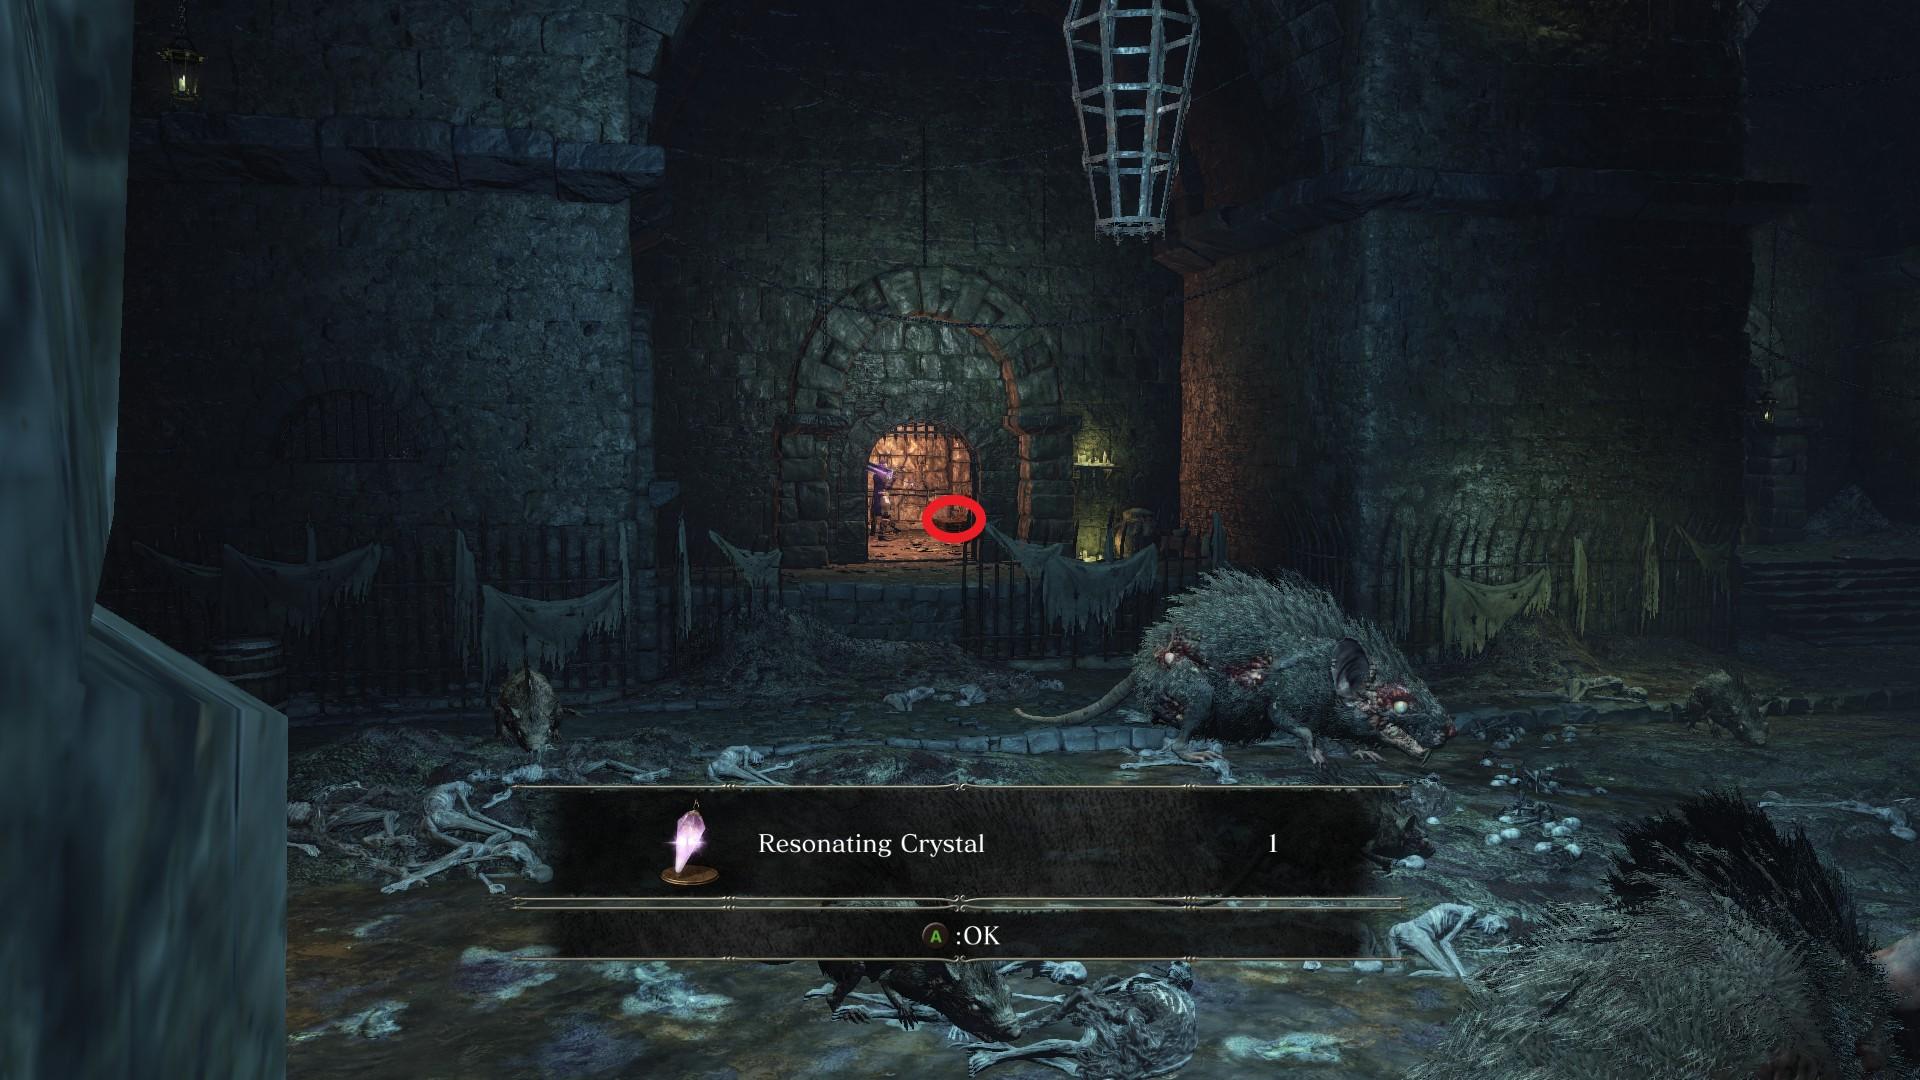 Resonating_Crystal_Irithyll_Dungeon.jpg